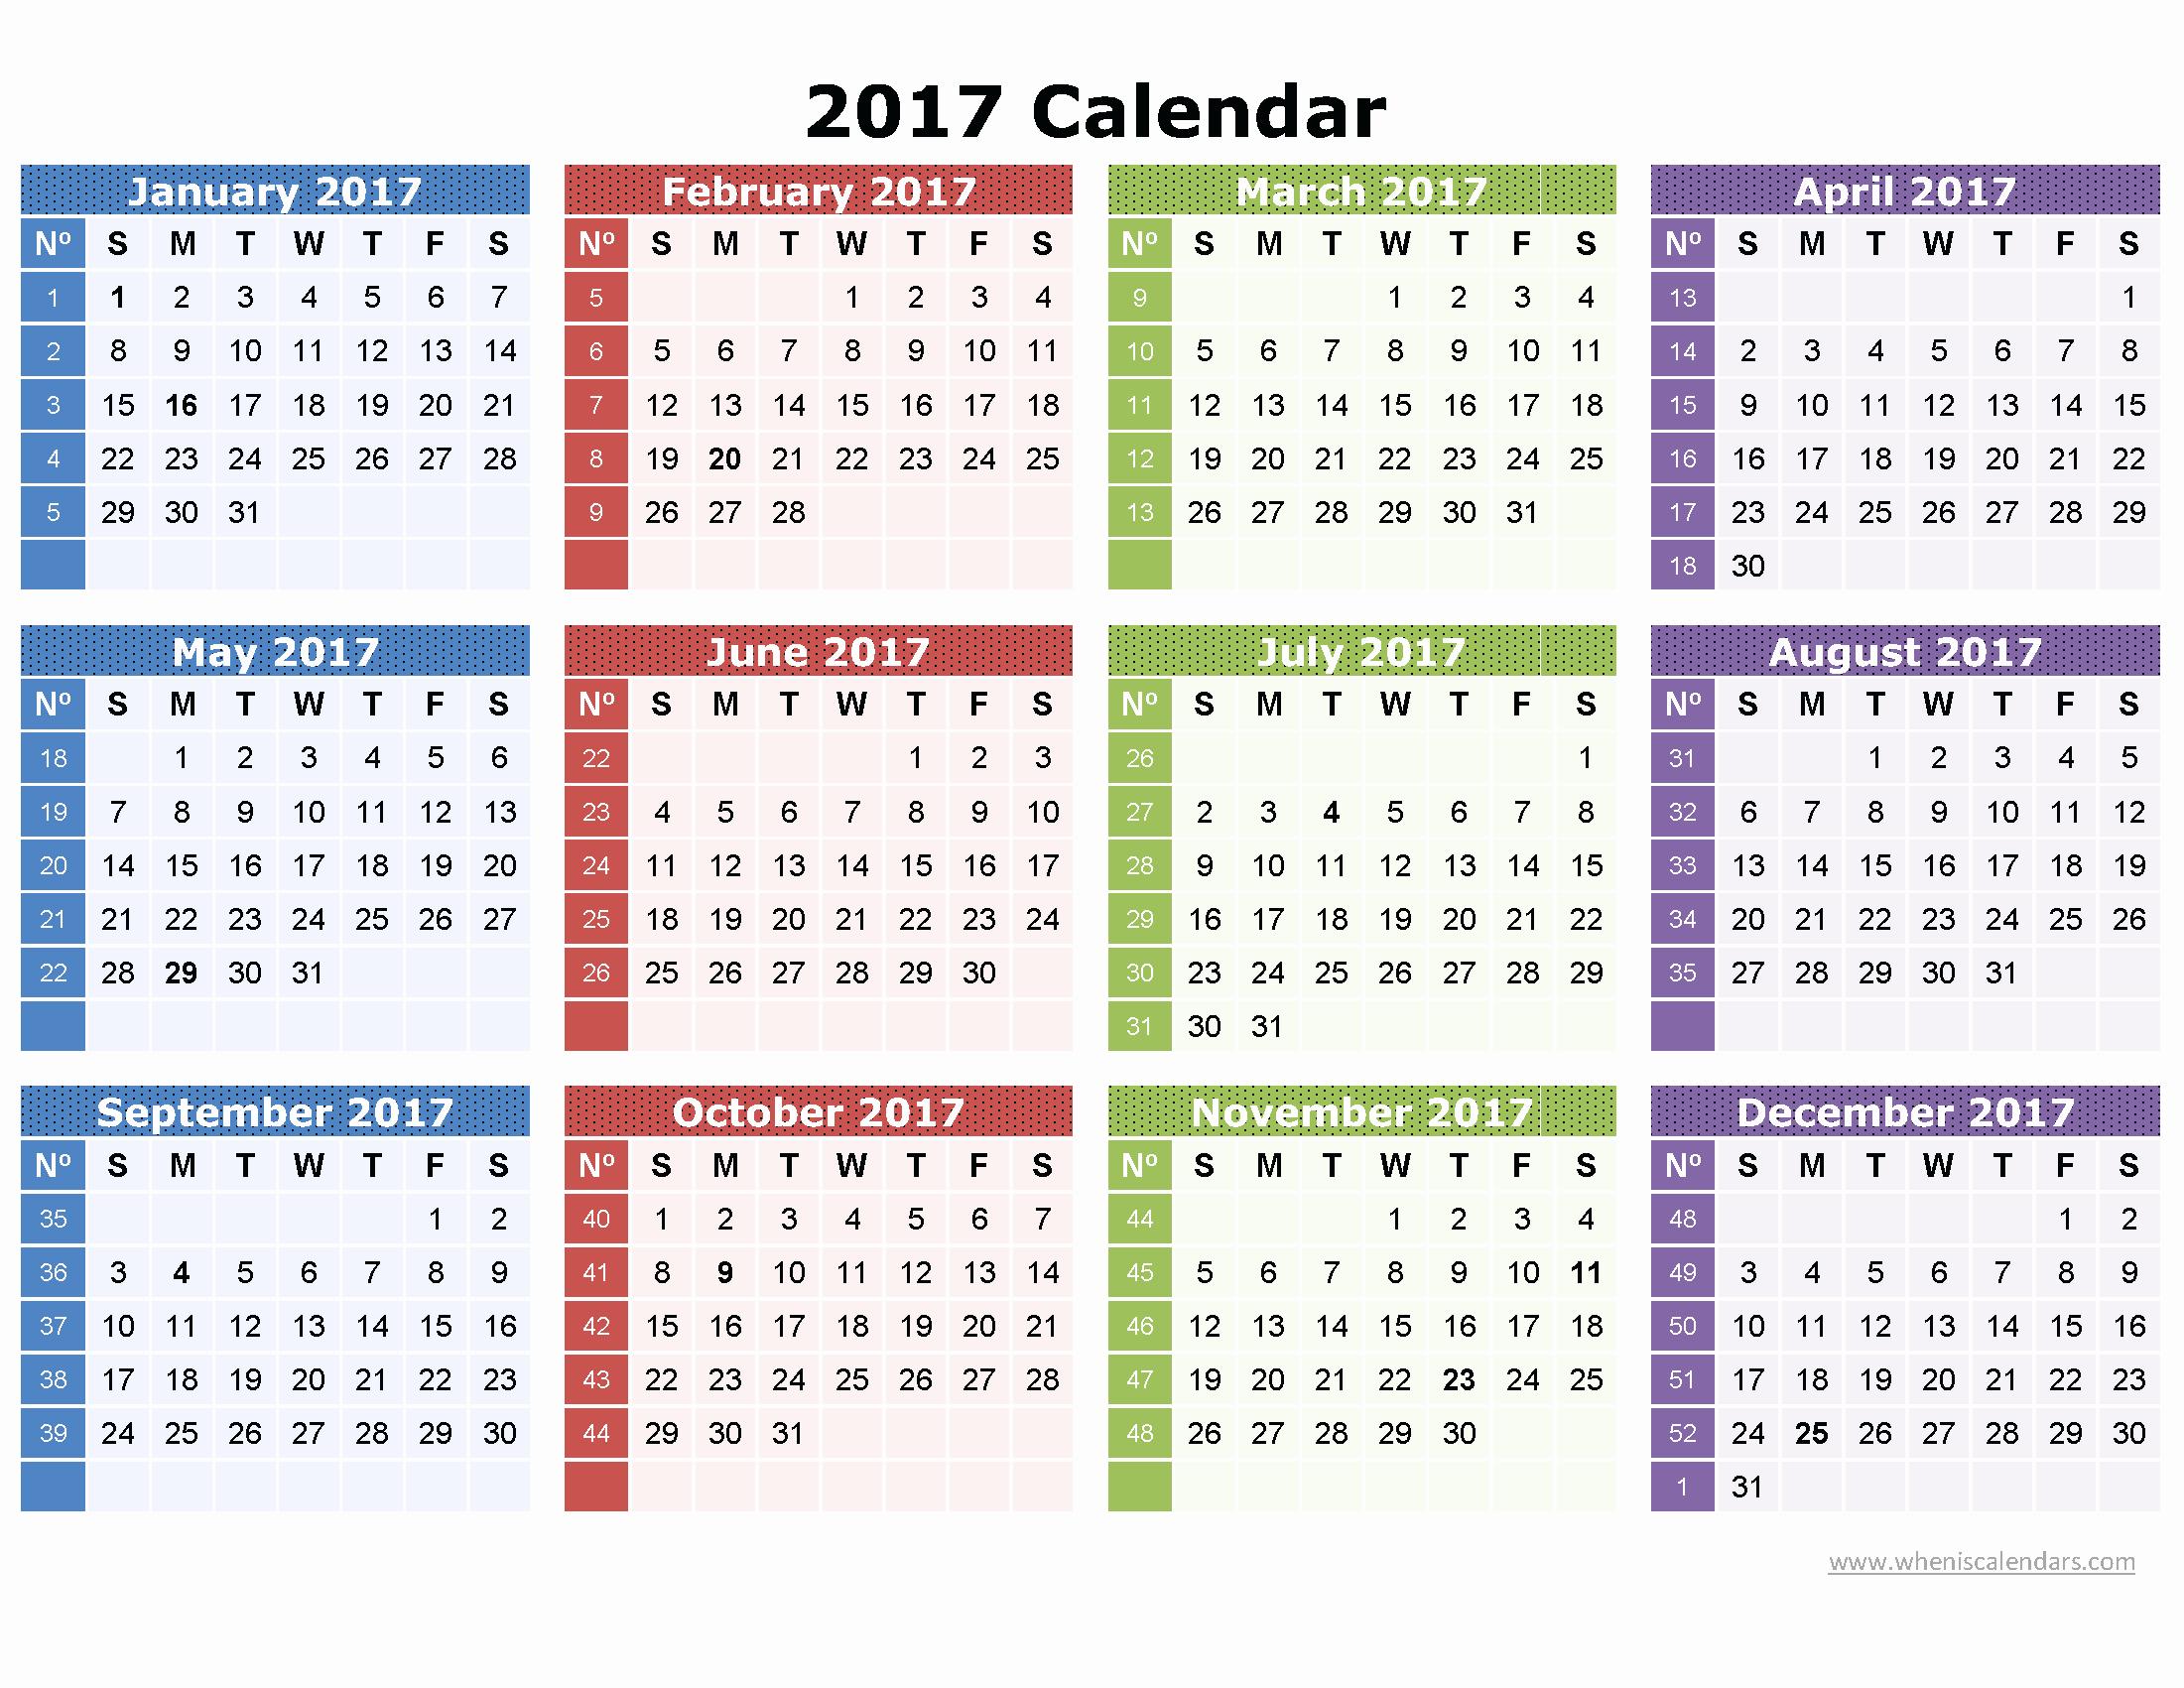 One Page Year Calendar 2017 Luxury 2017 Year Calendar Wallpaper Download Free 2017 Calendar